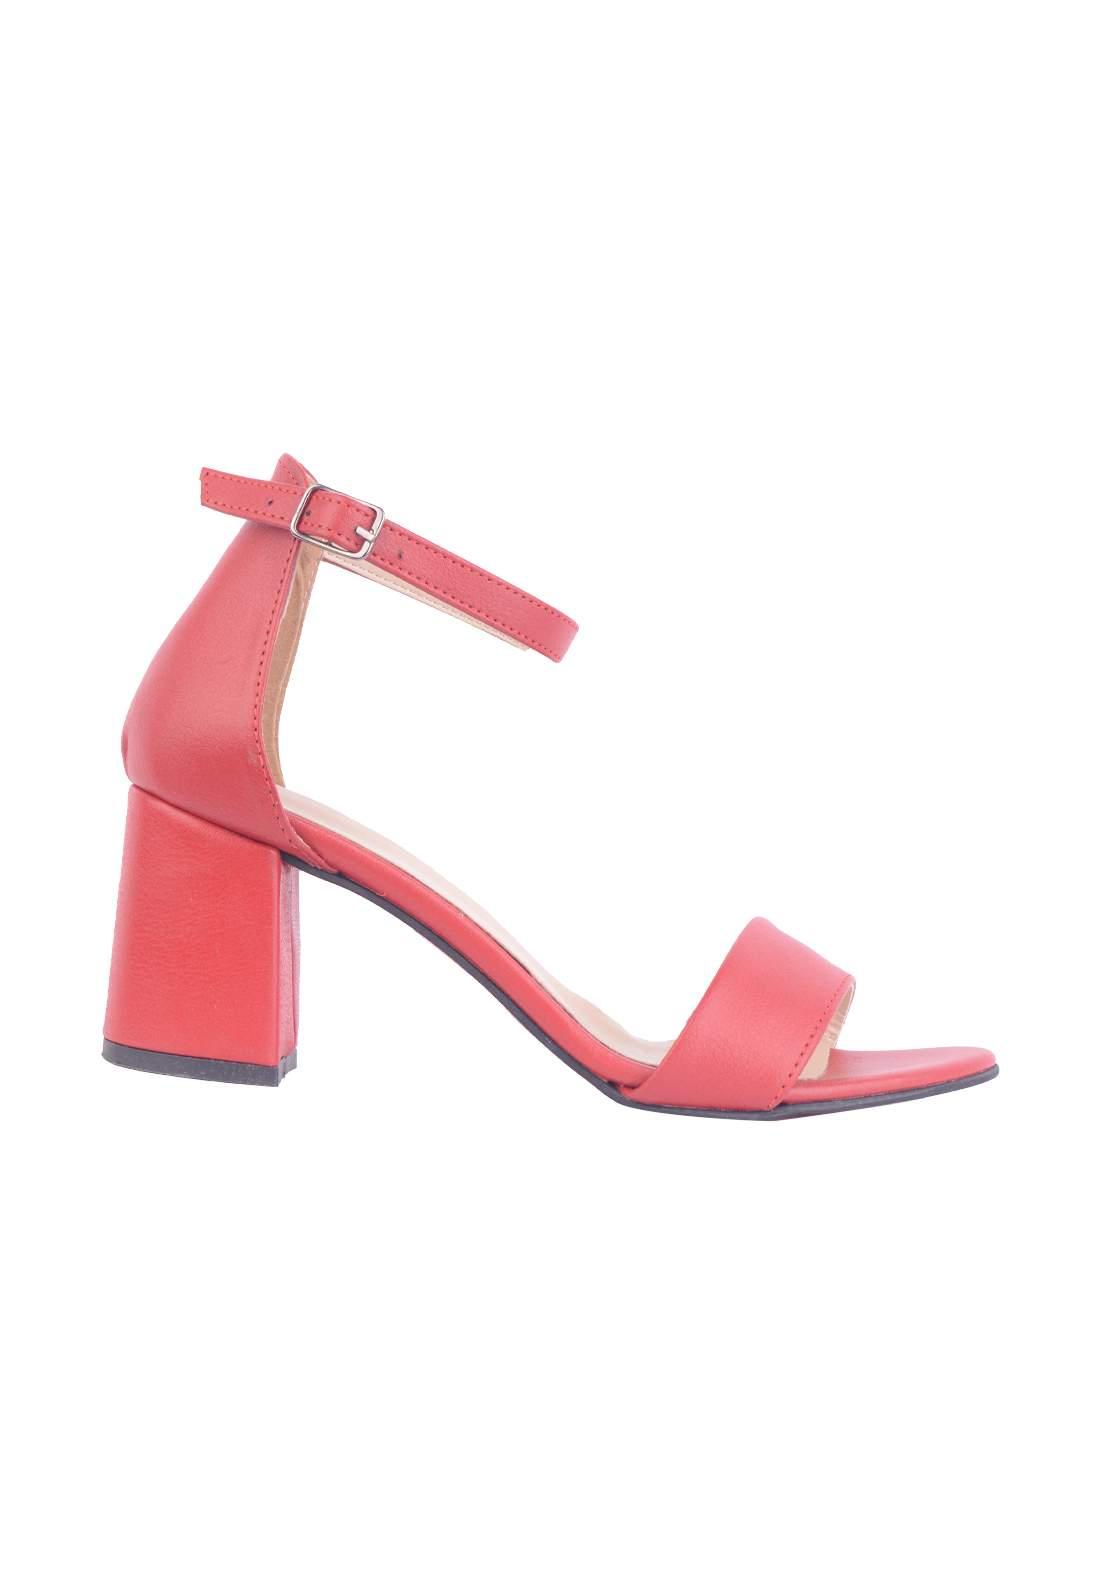 حذاء كعب نسائي احمر اللون